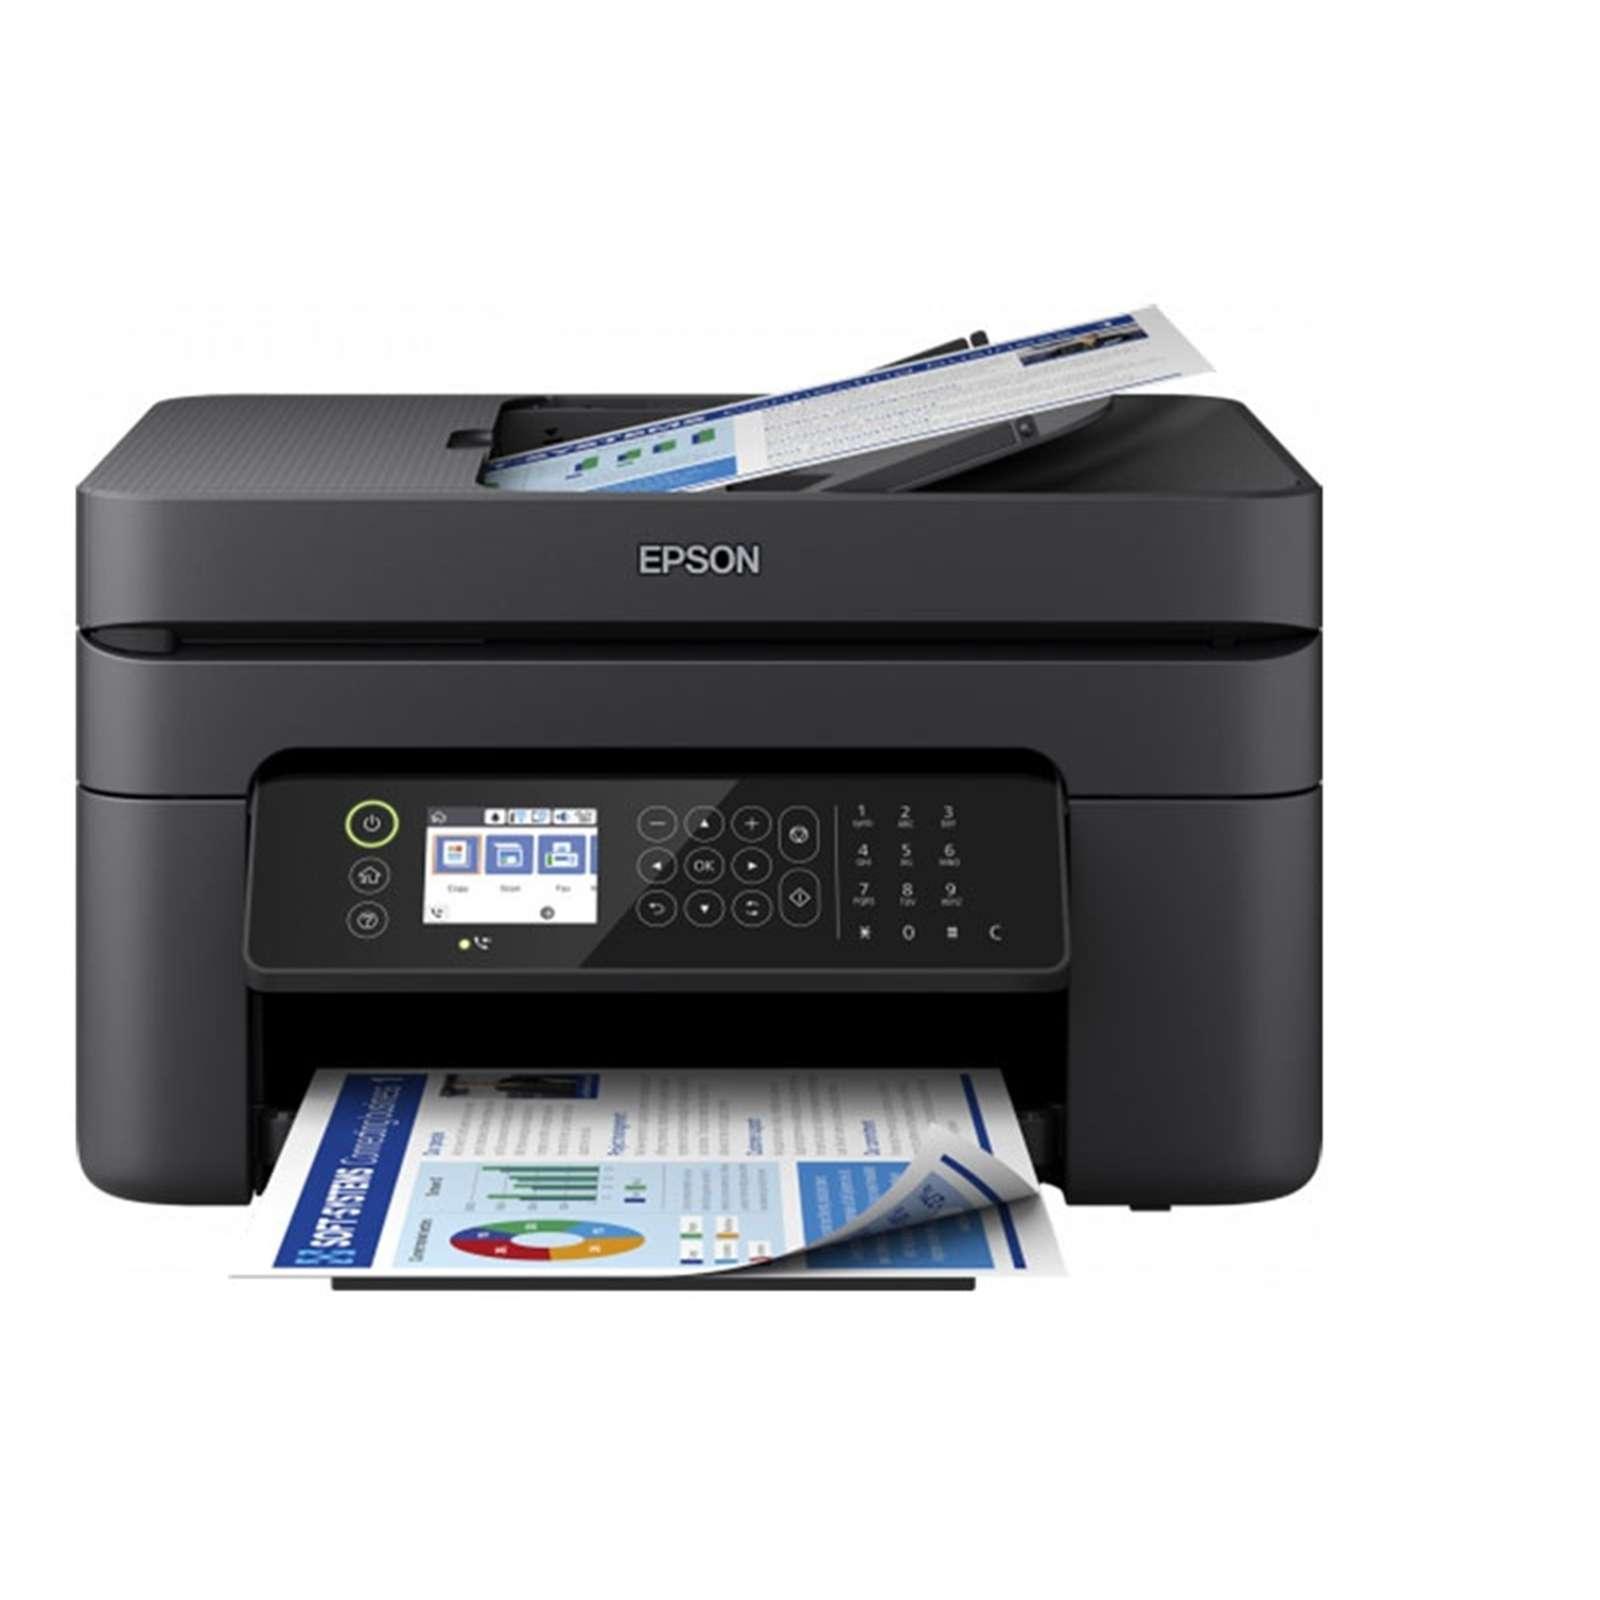 Epson WorkForce WF-2850DWF (A4) Colour Wireless Inkjet Printer